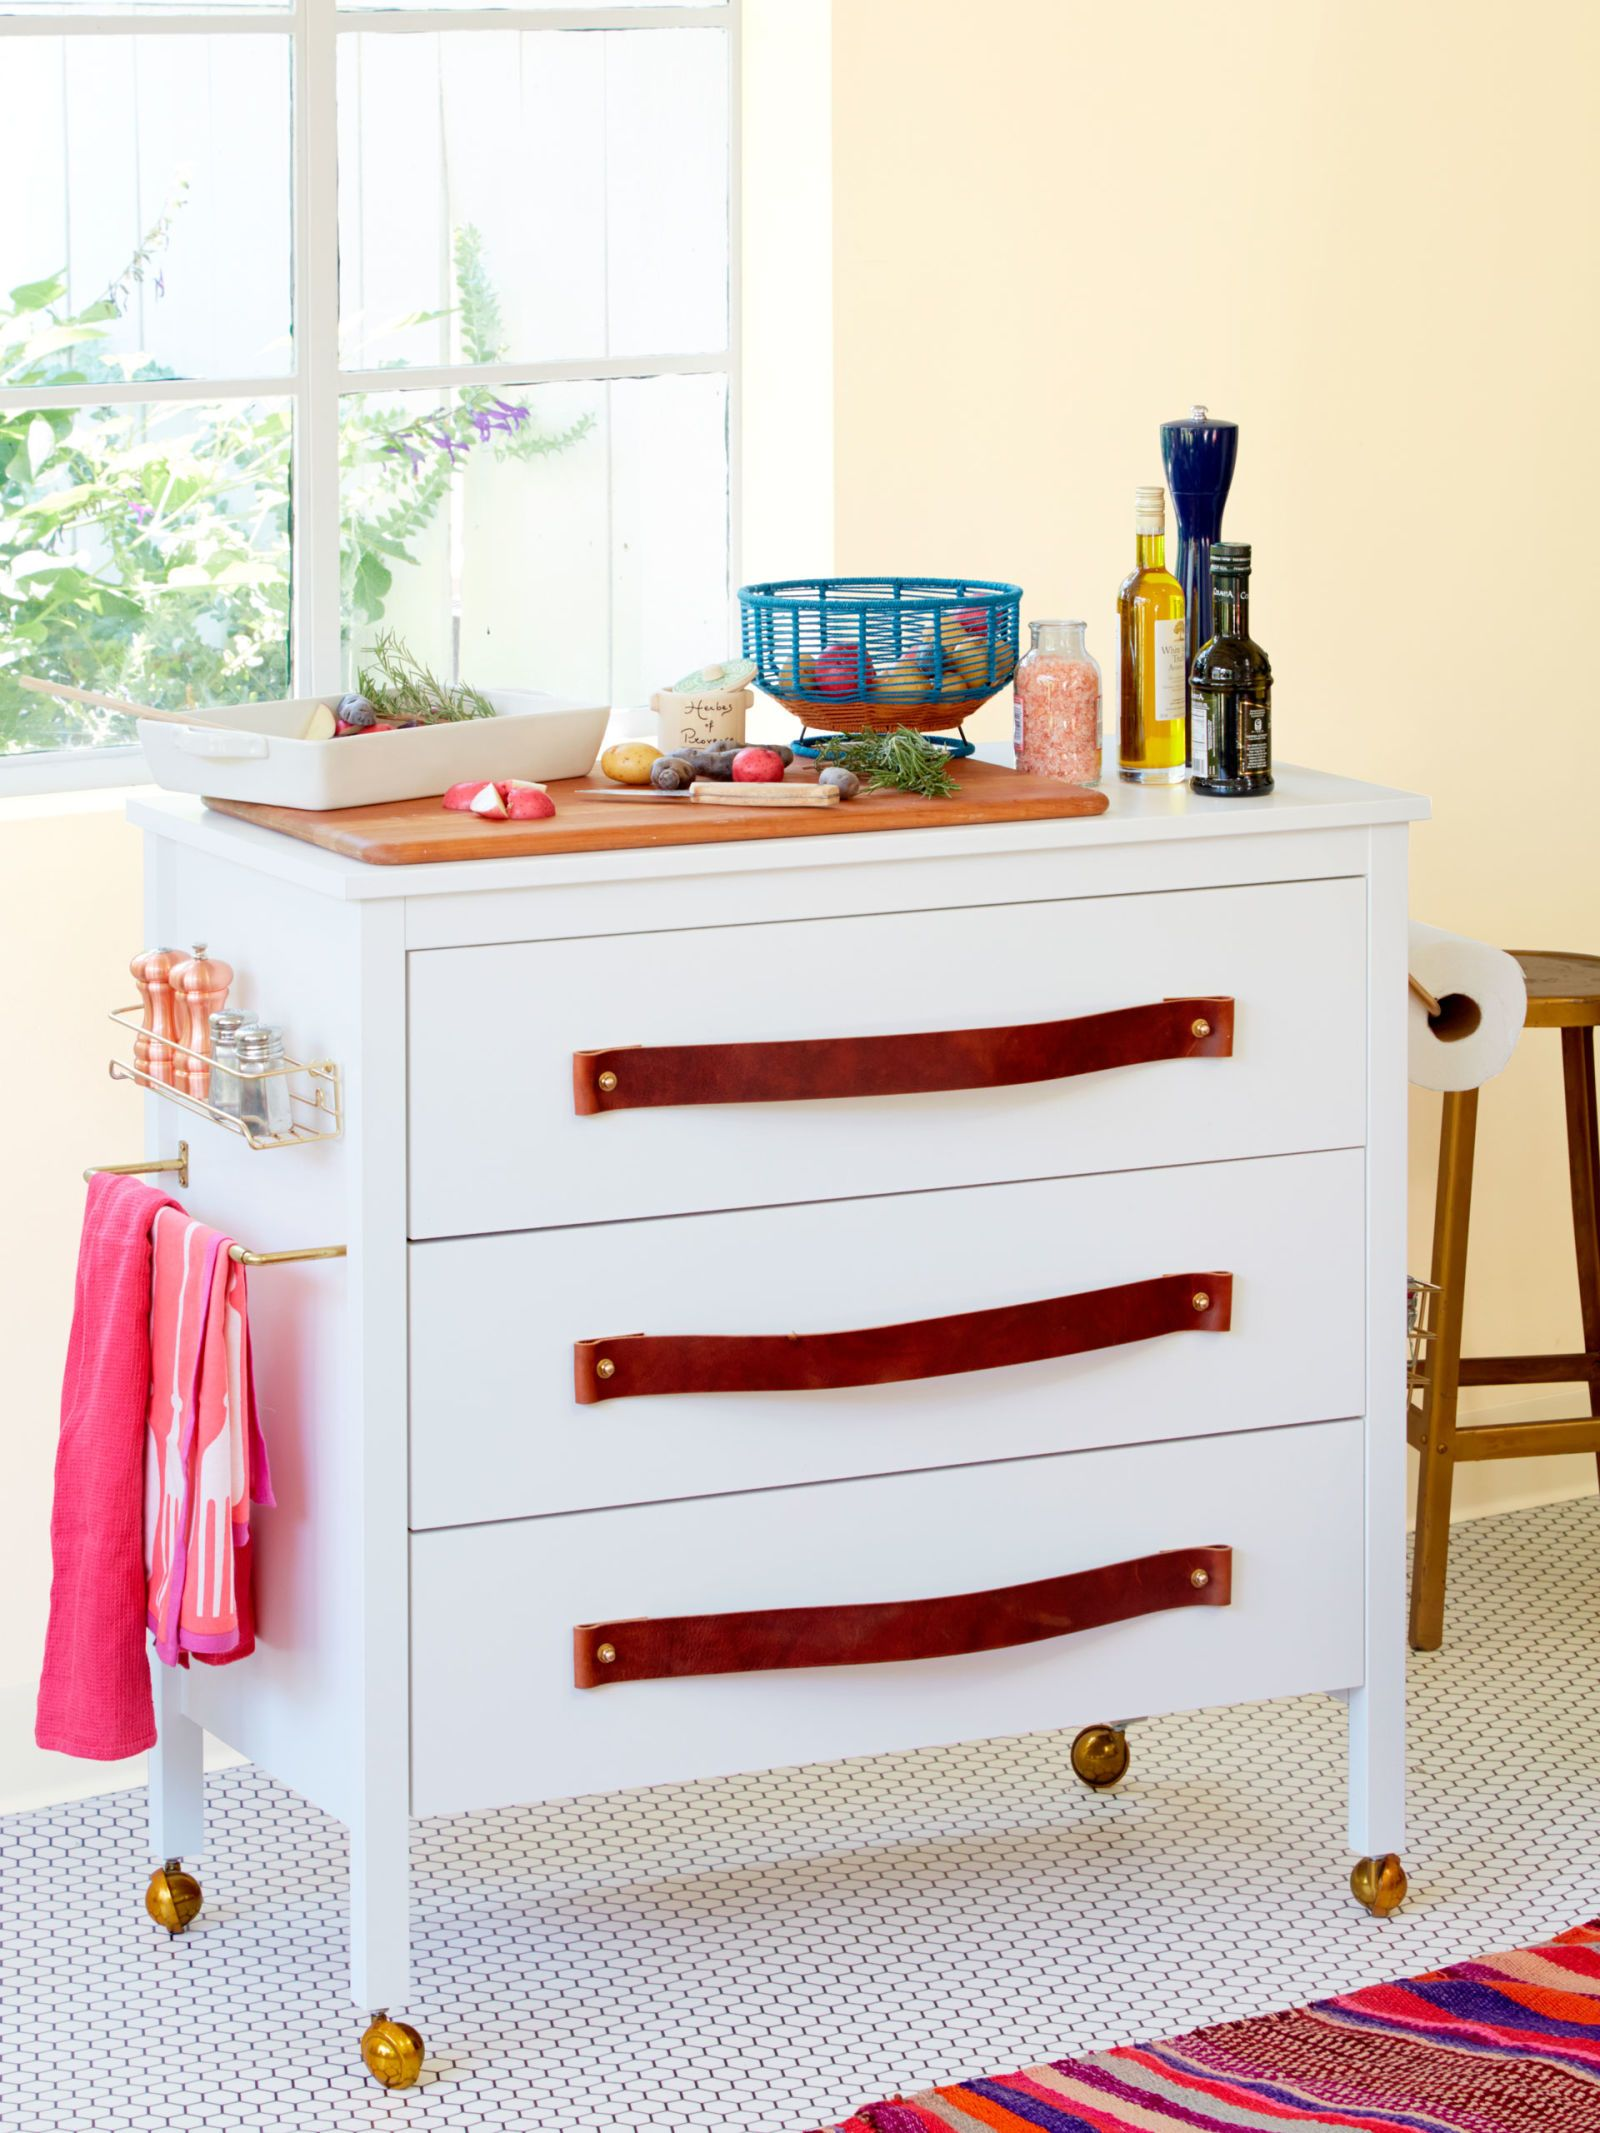 Ikea hack alert turn a dresser into a kitchen island house ideas